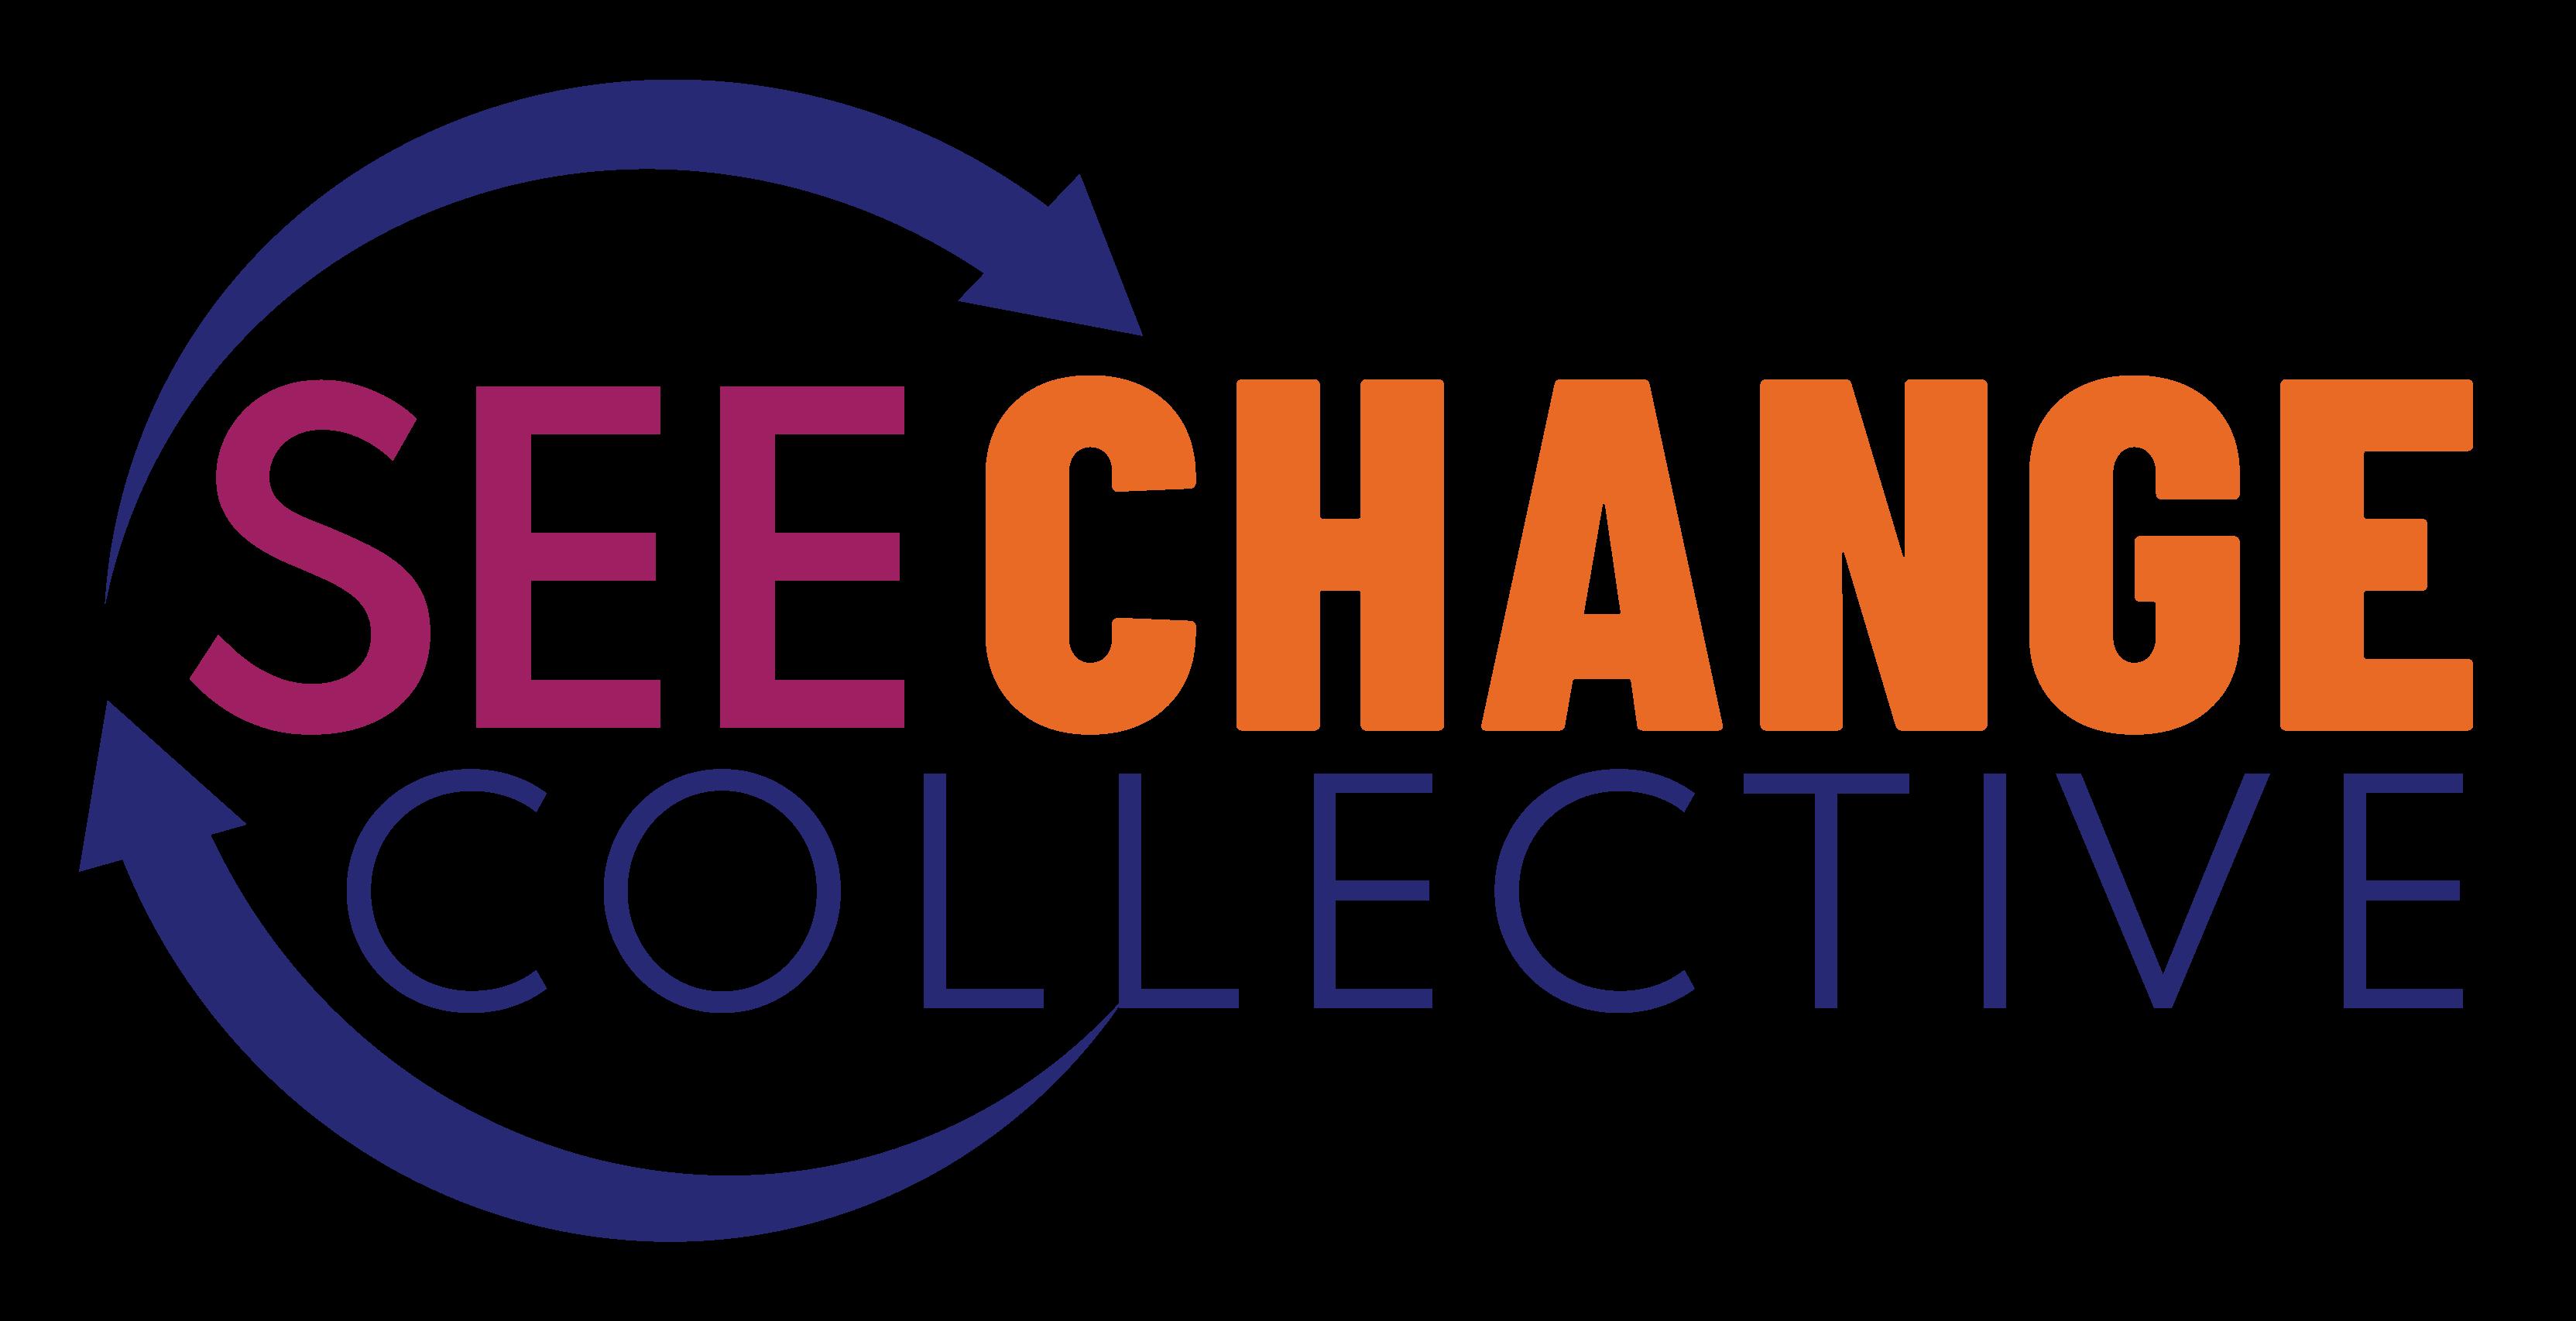 See change logo